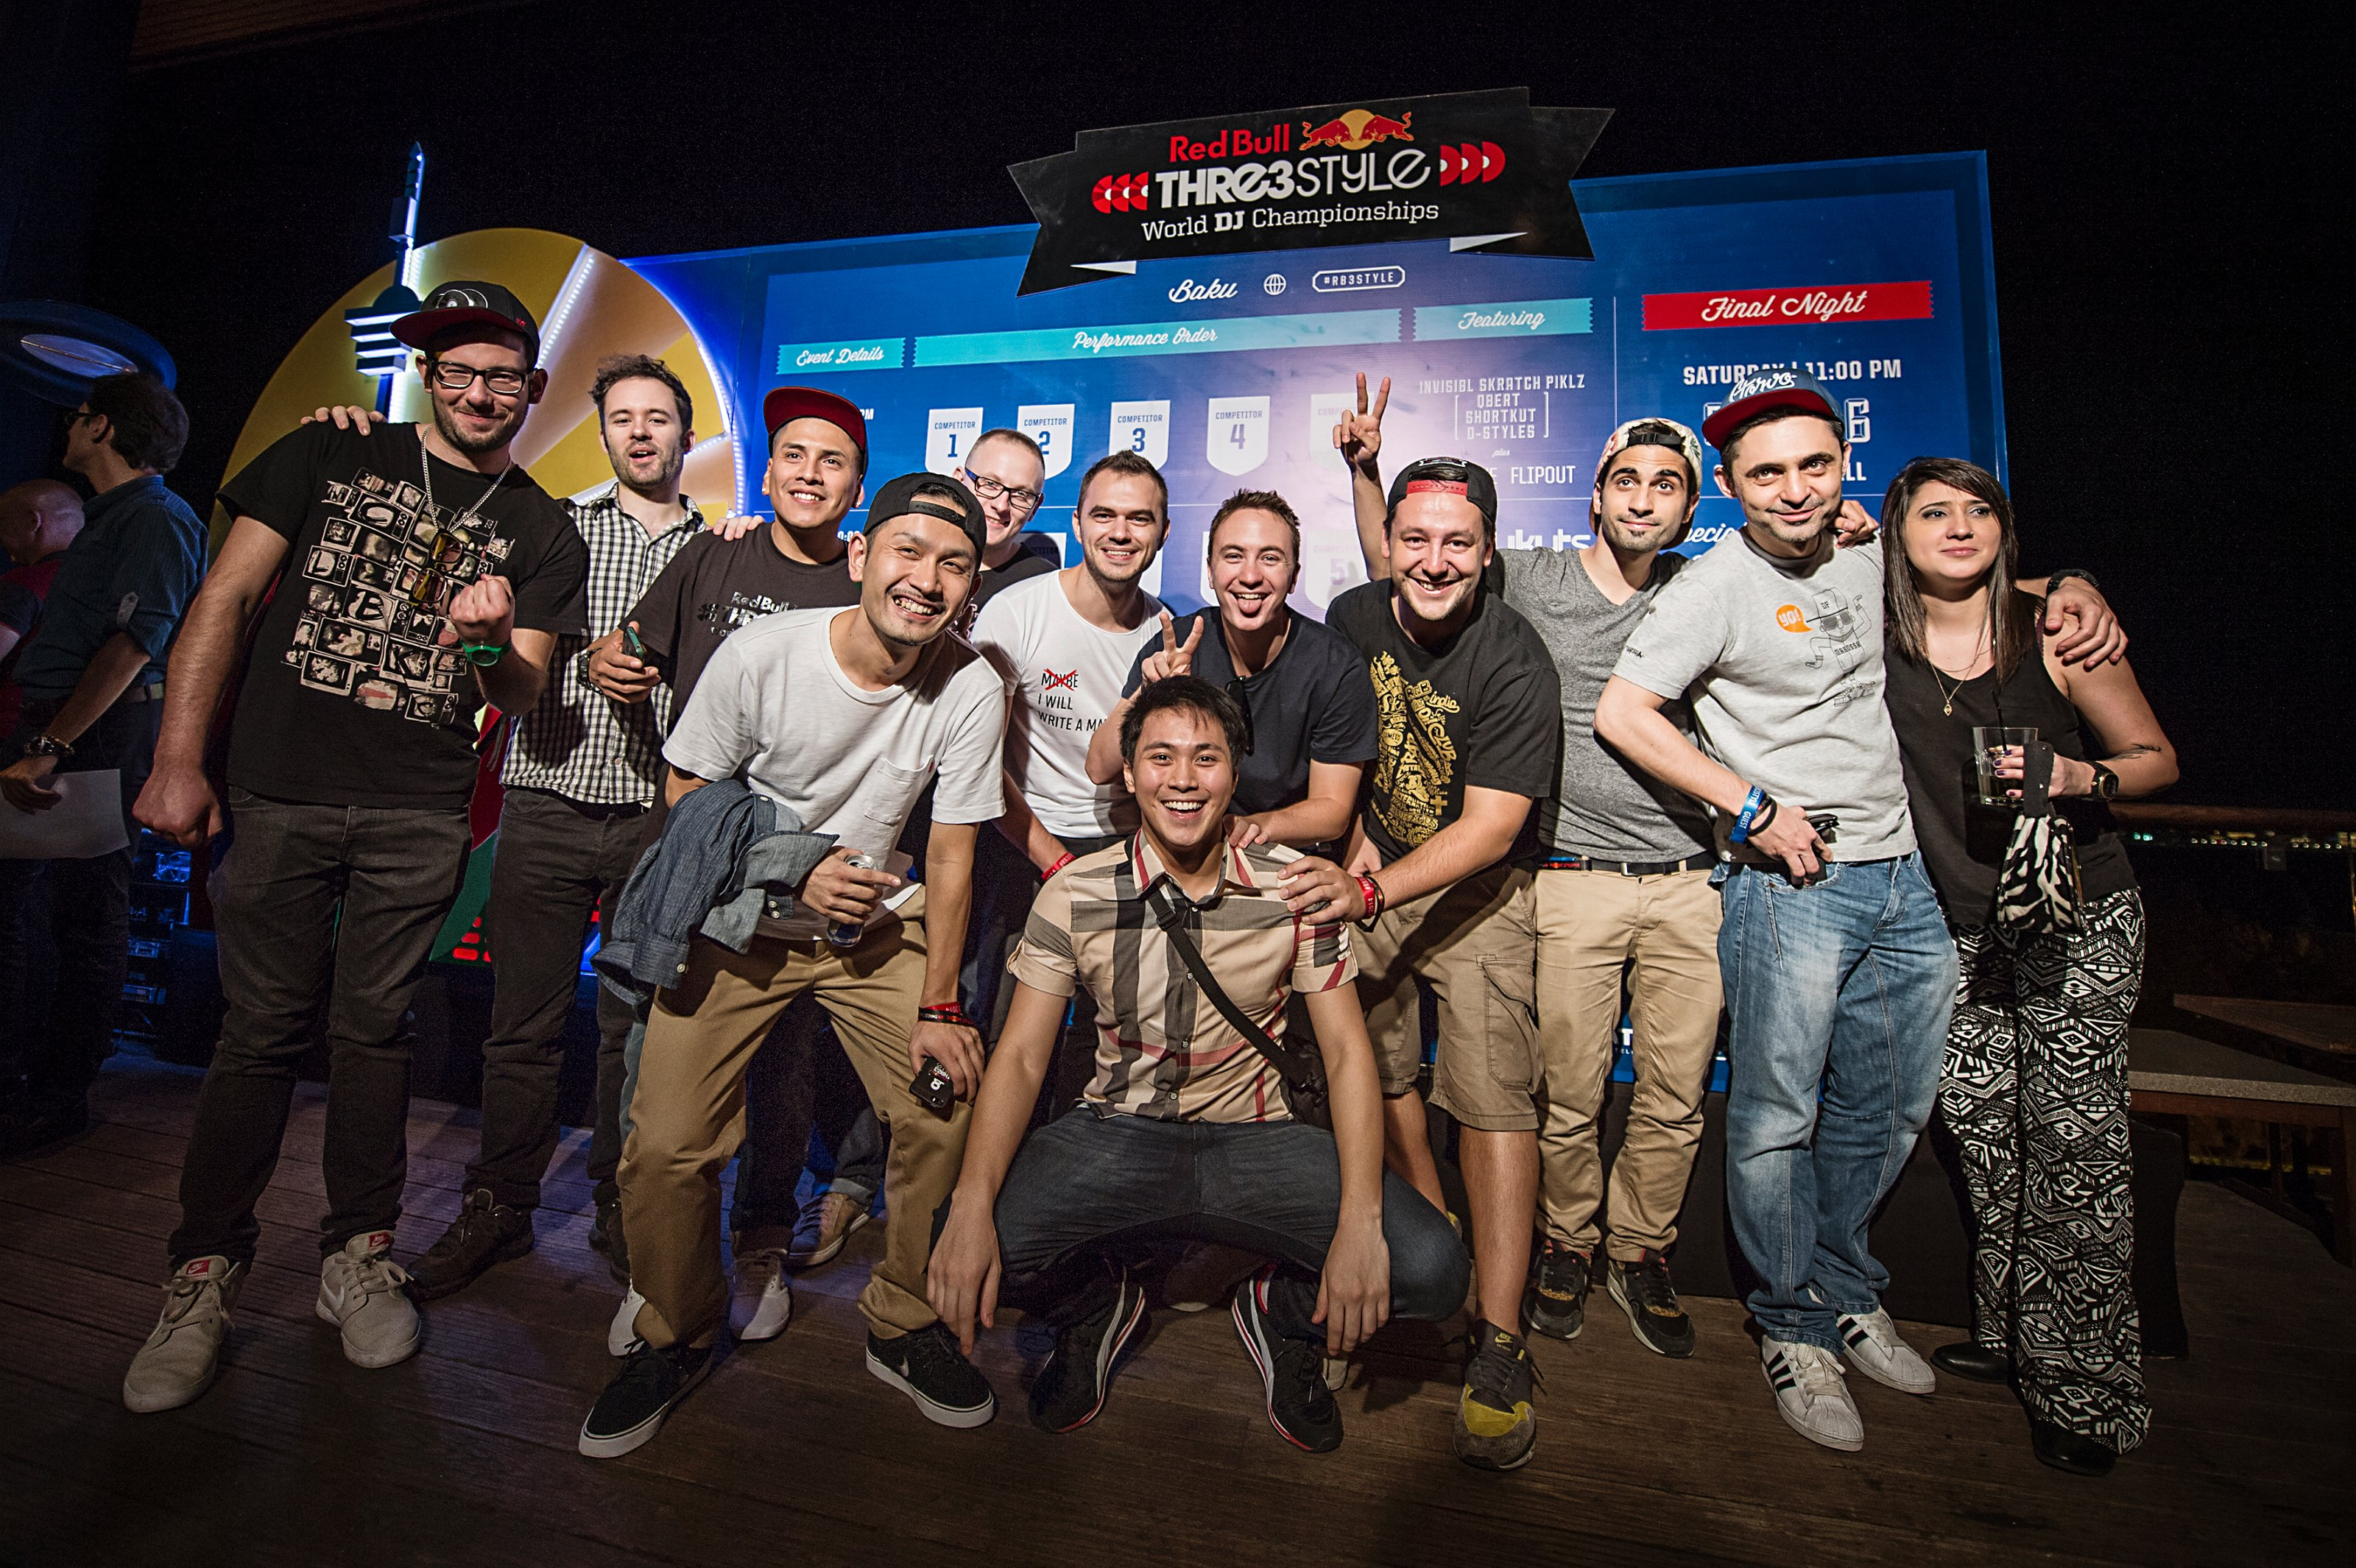 Red Bull Thre3style World Final 2014 Azerbaijan Participants - Portrait - Nika KramerRed Bull Content Pool